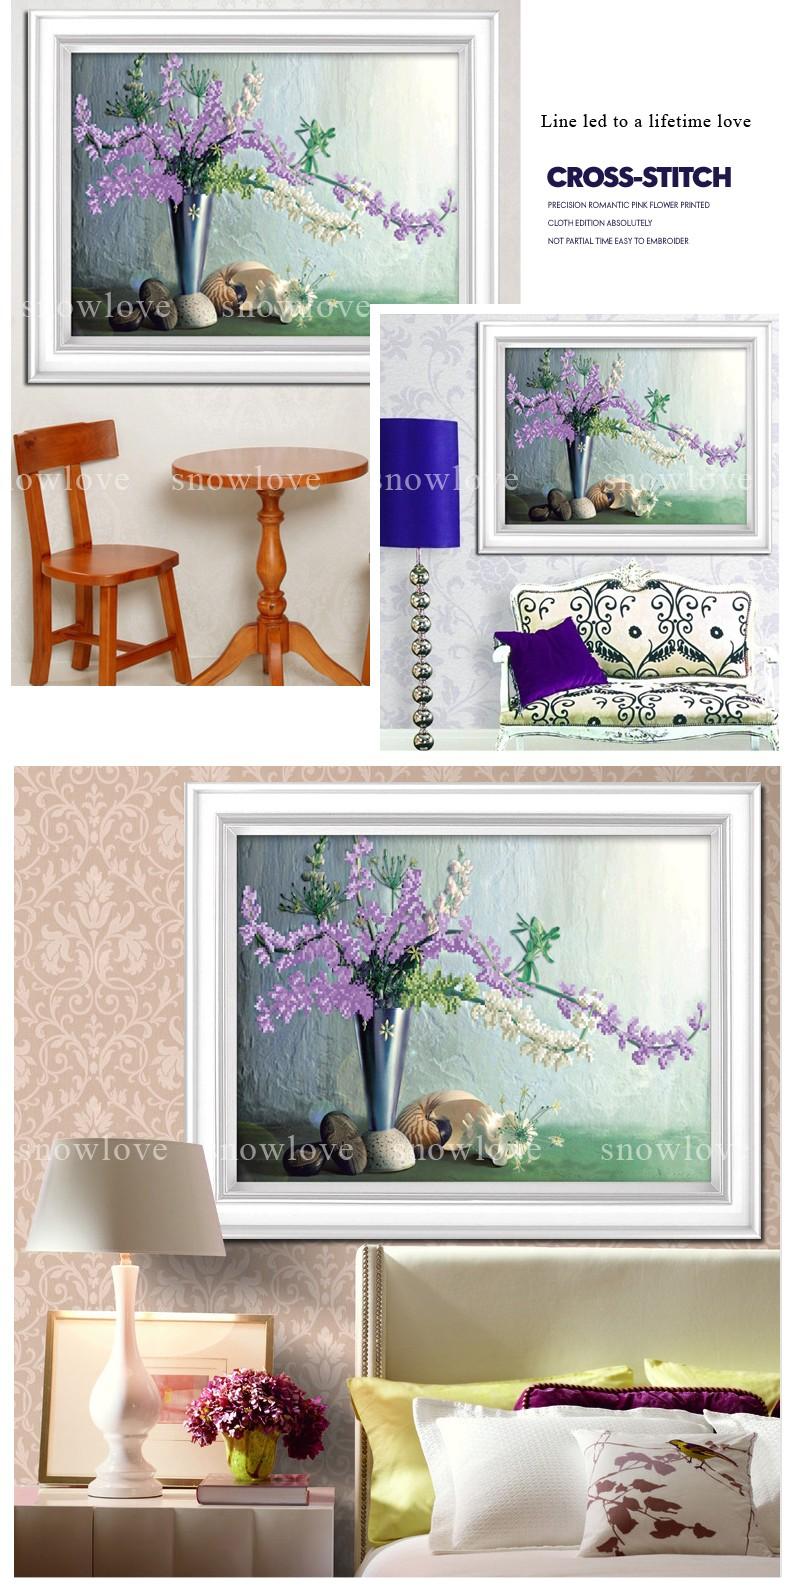 ộ_ộ ༽Snowlov, costura, bordado, DIY Floral, punto de cruz, kits ...